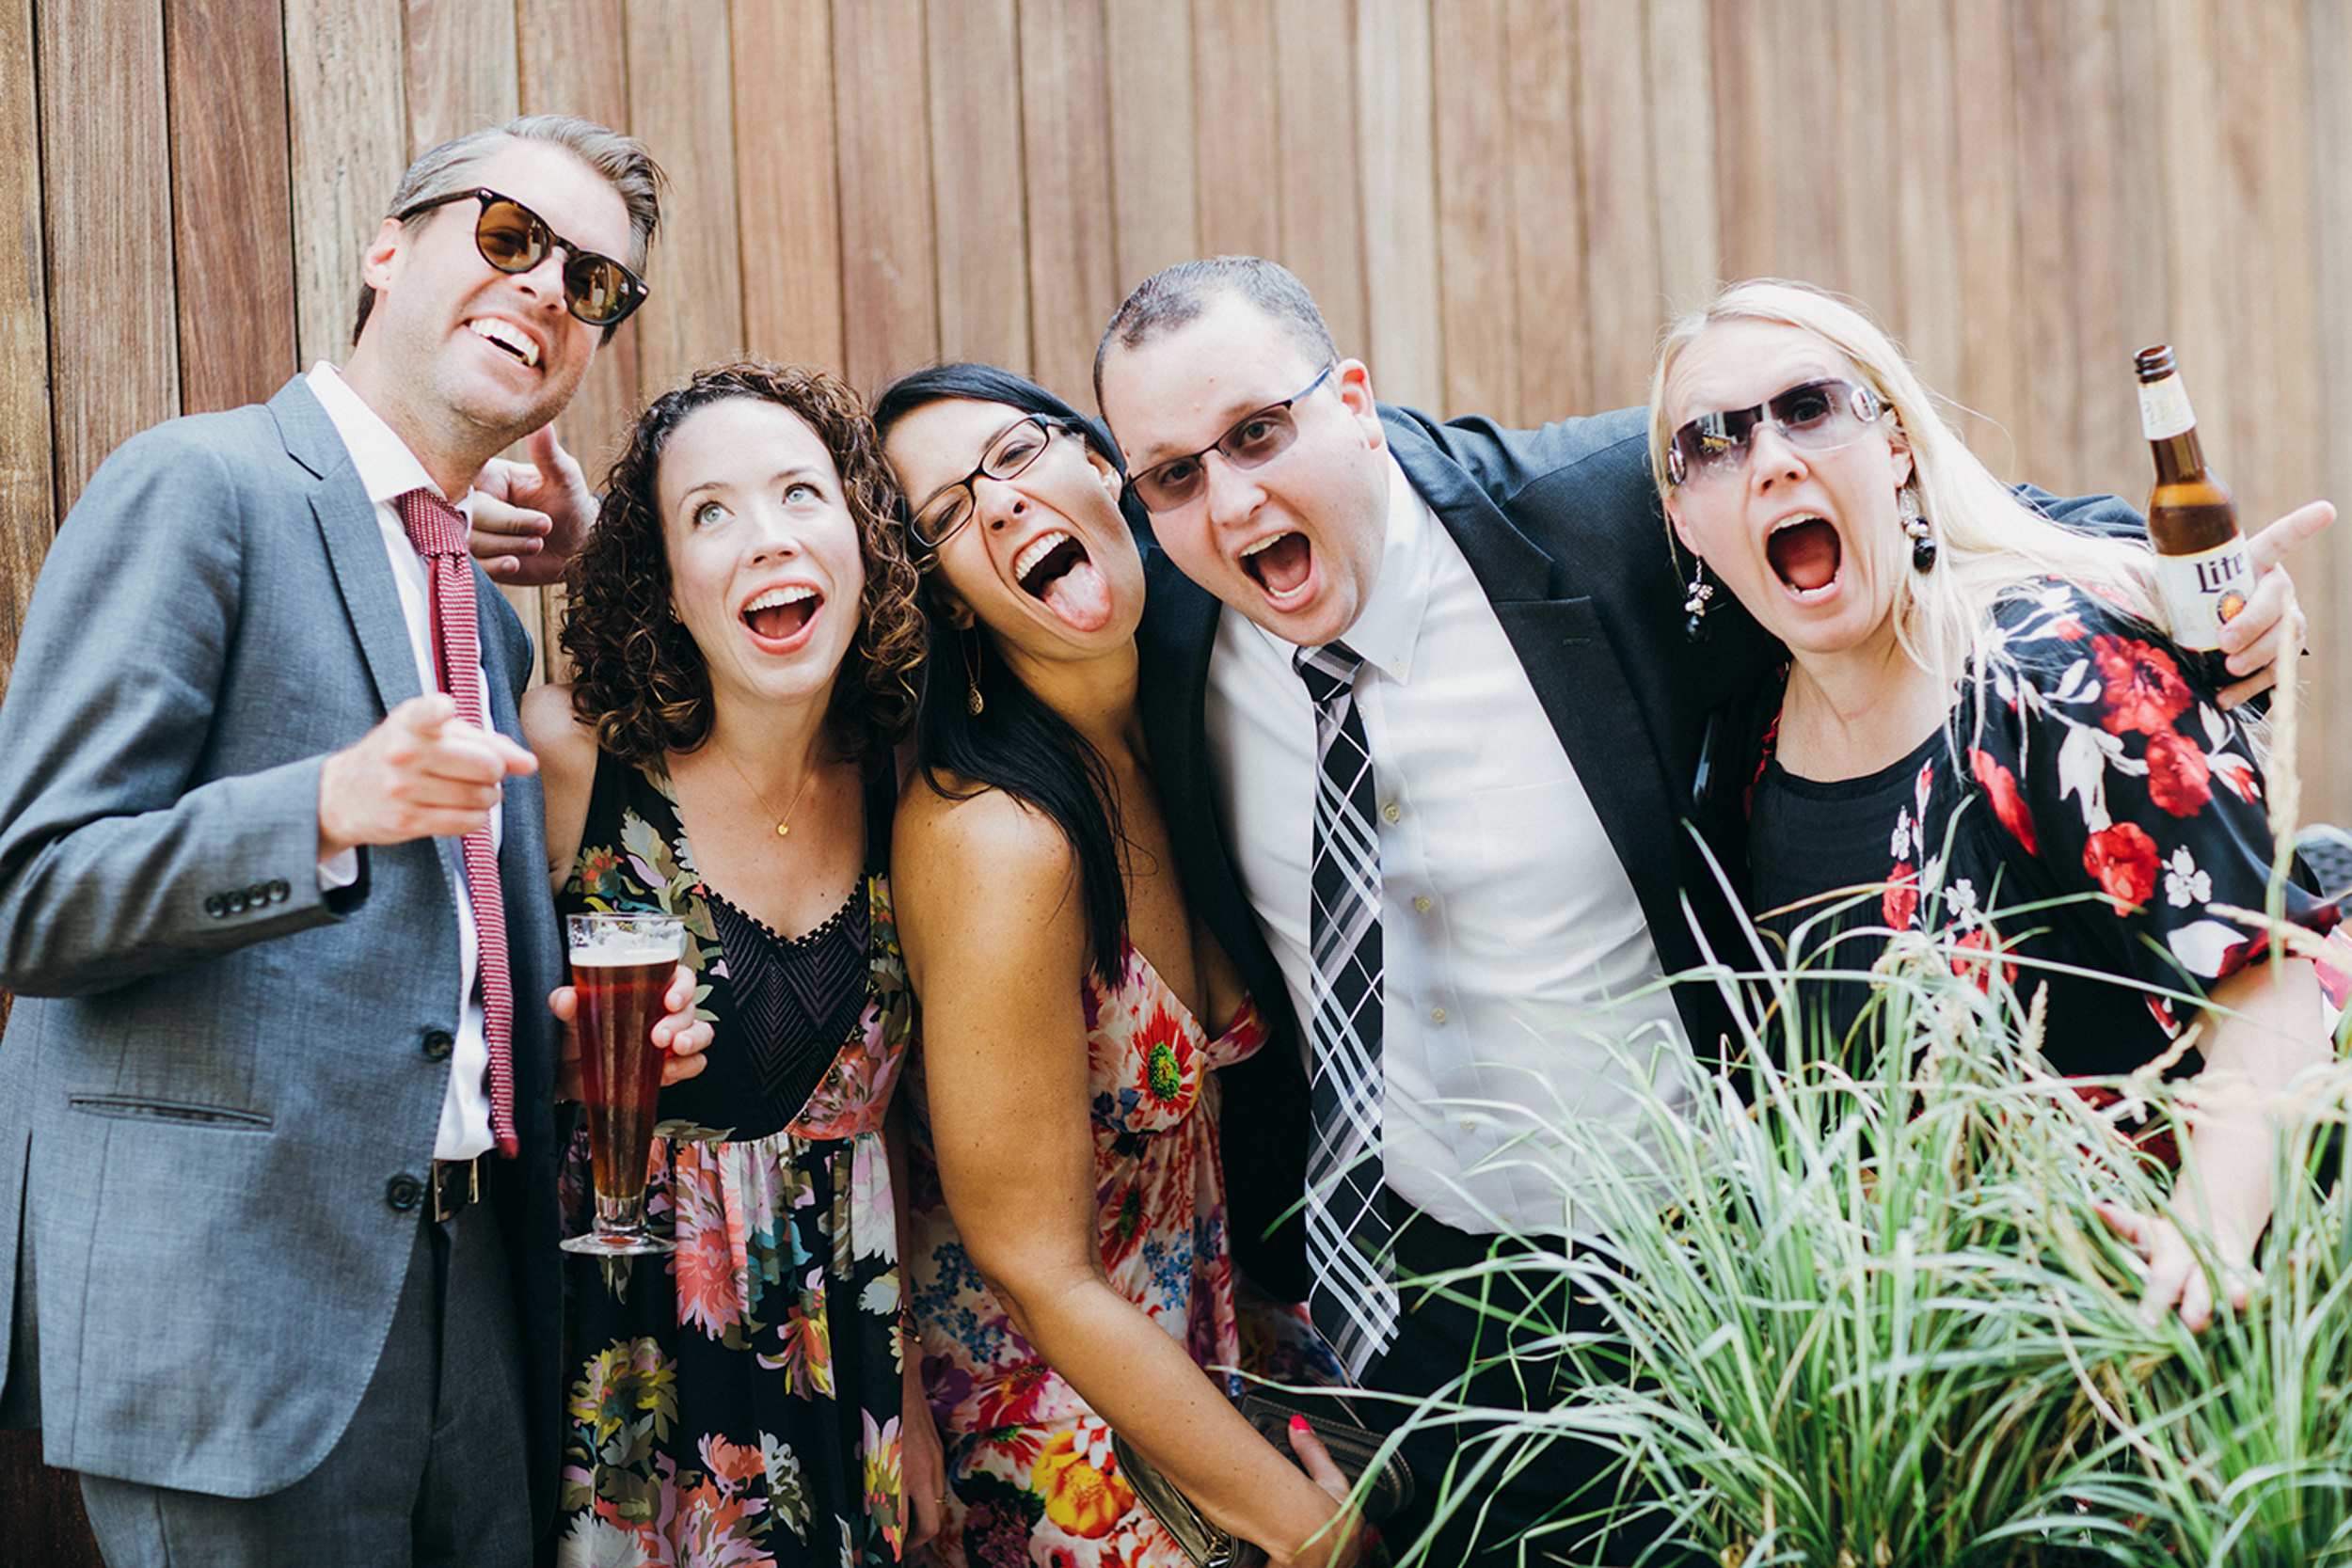 chicago.wedding.urban.intimate.zed451.lake.milton olive park-82.jpg